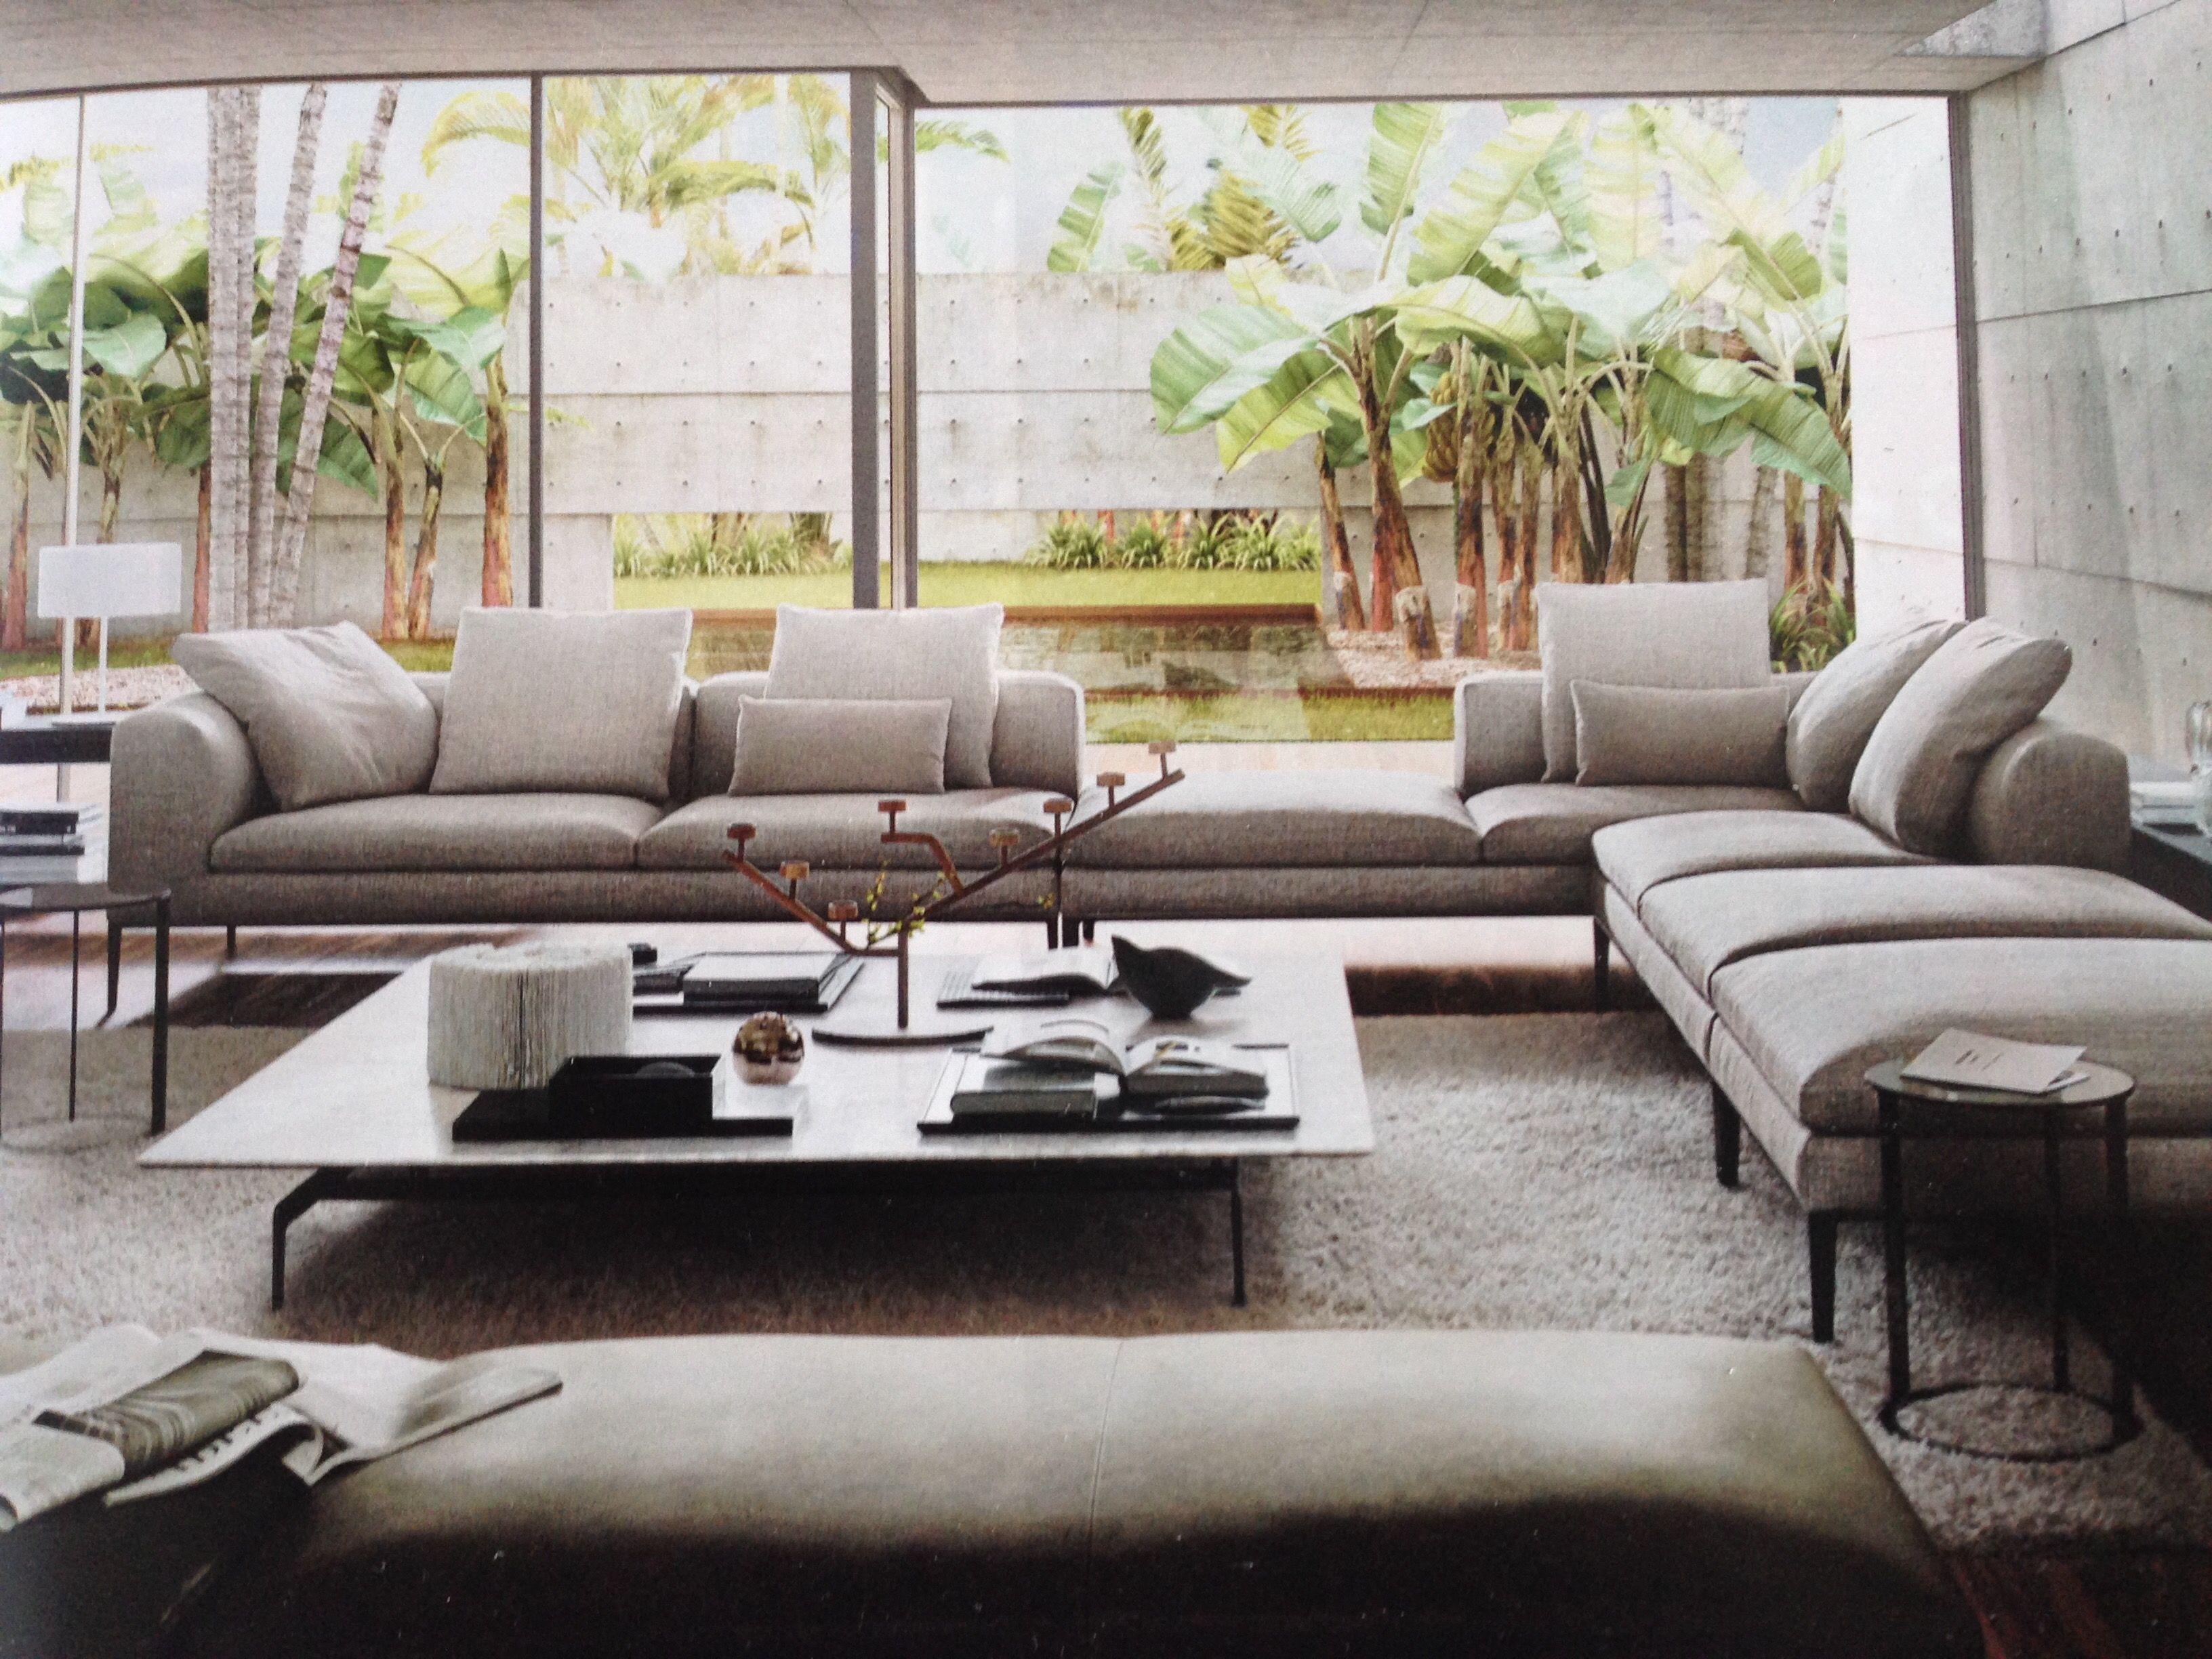 Pin von Ryan ke auf Living room / 客廳 | Pinterest